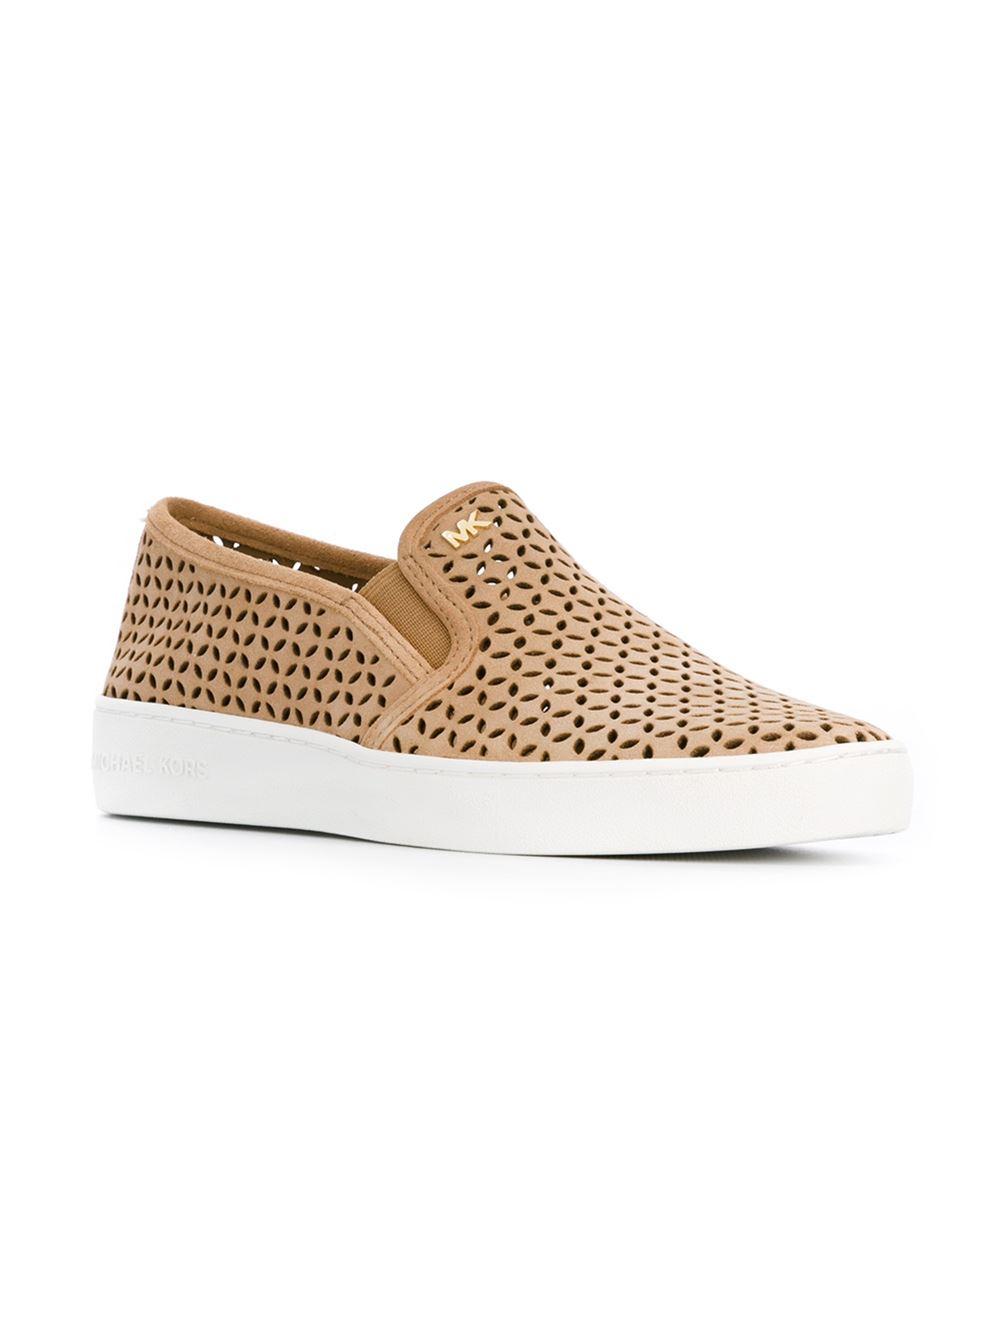 e71f4367 MICHAEL Michael Kors 'olivia' Slip-on Sneakers in Natural - Lyst